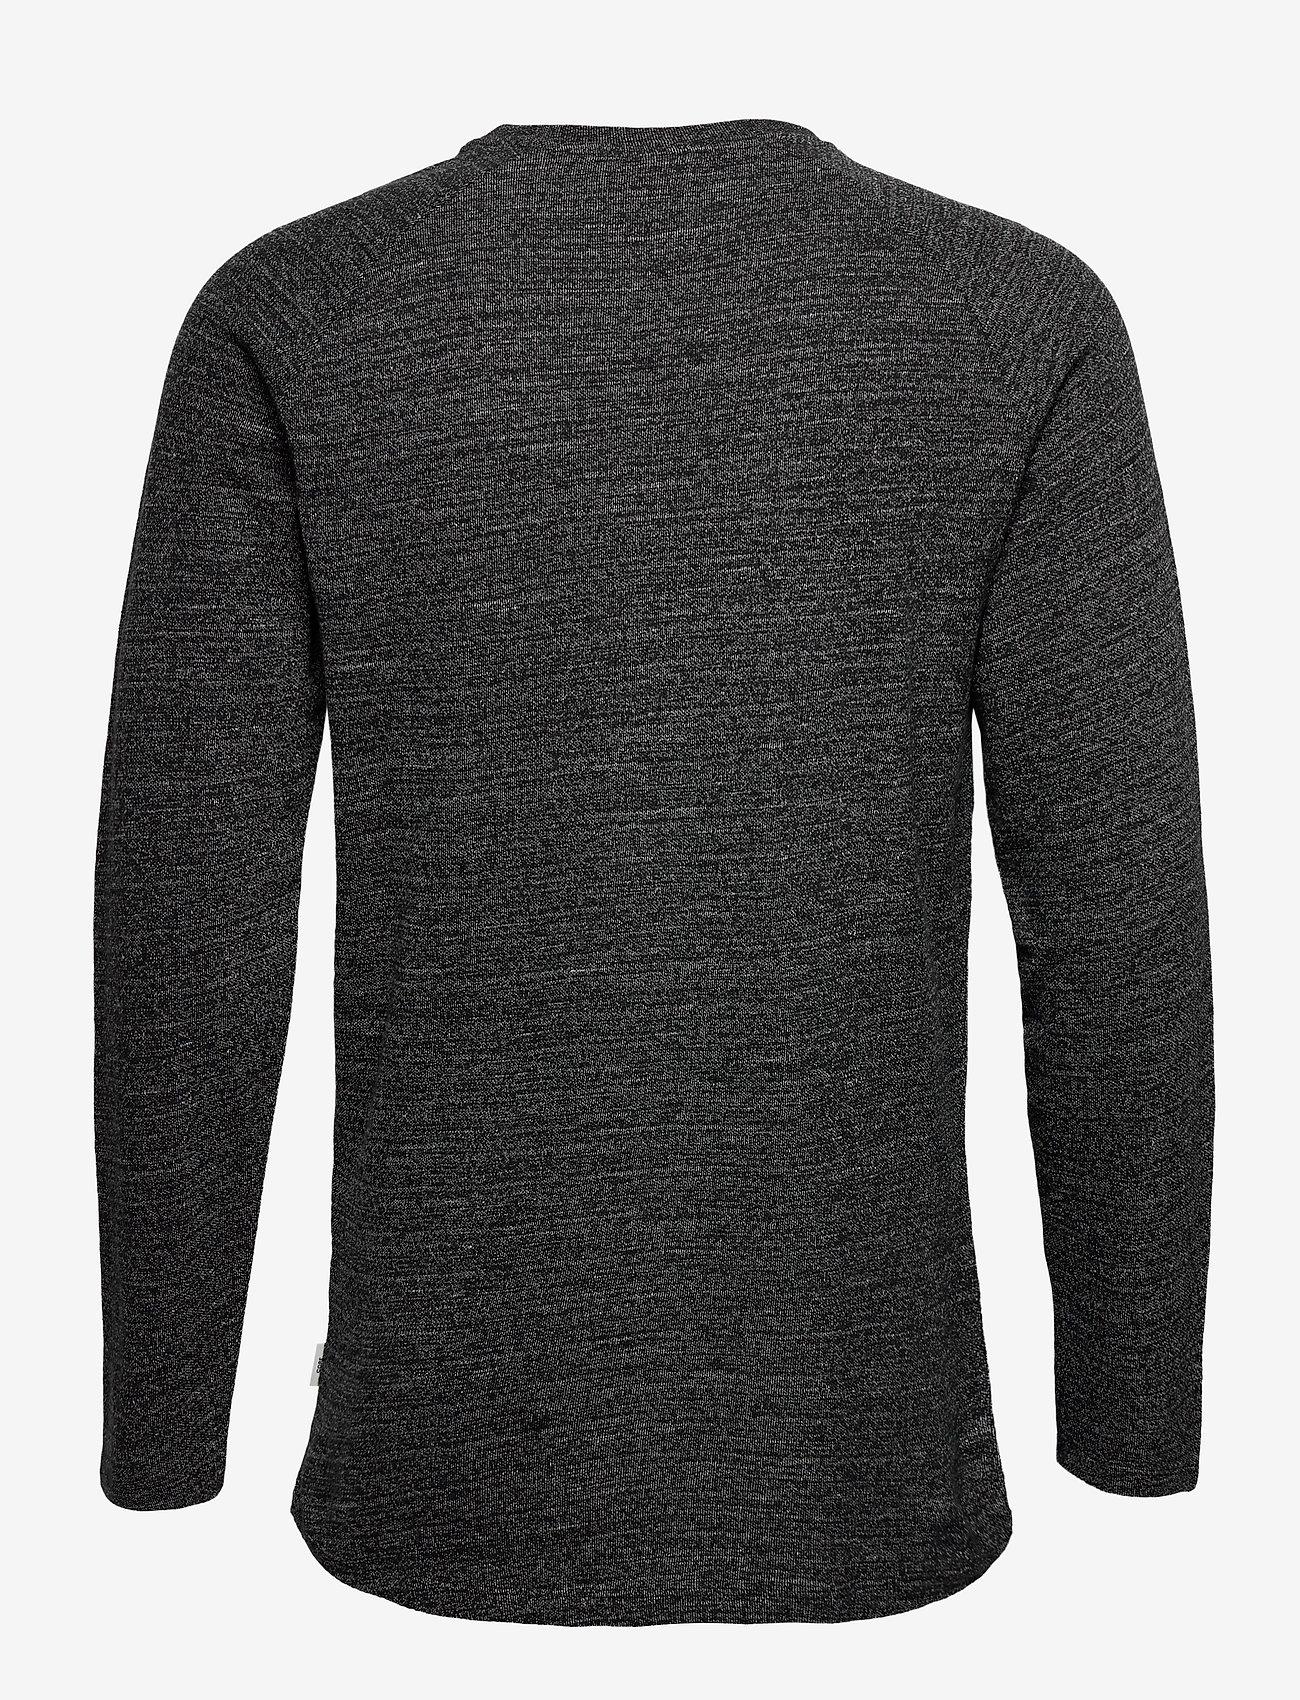 Jack & Jones - JCOOZIL TEE LS CREW NECK NOOS. - basic t-shirts - black melange - 1